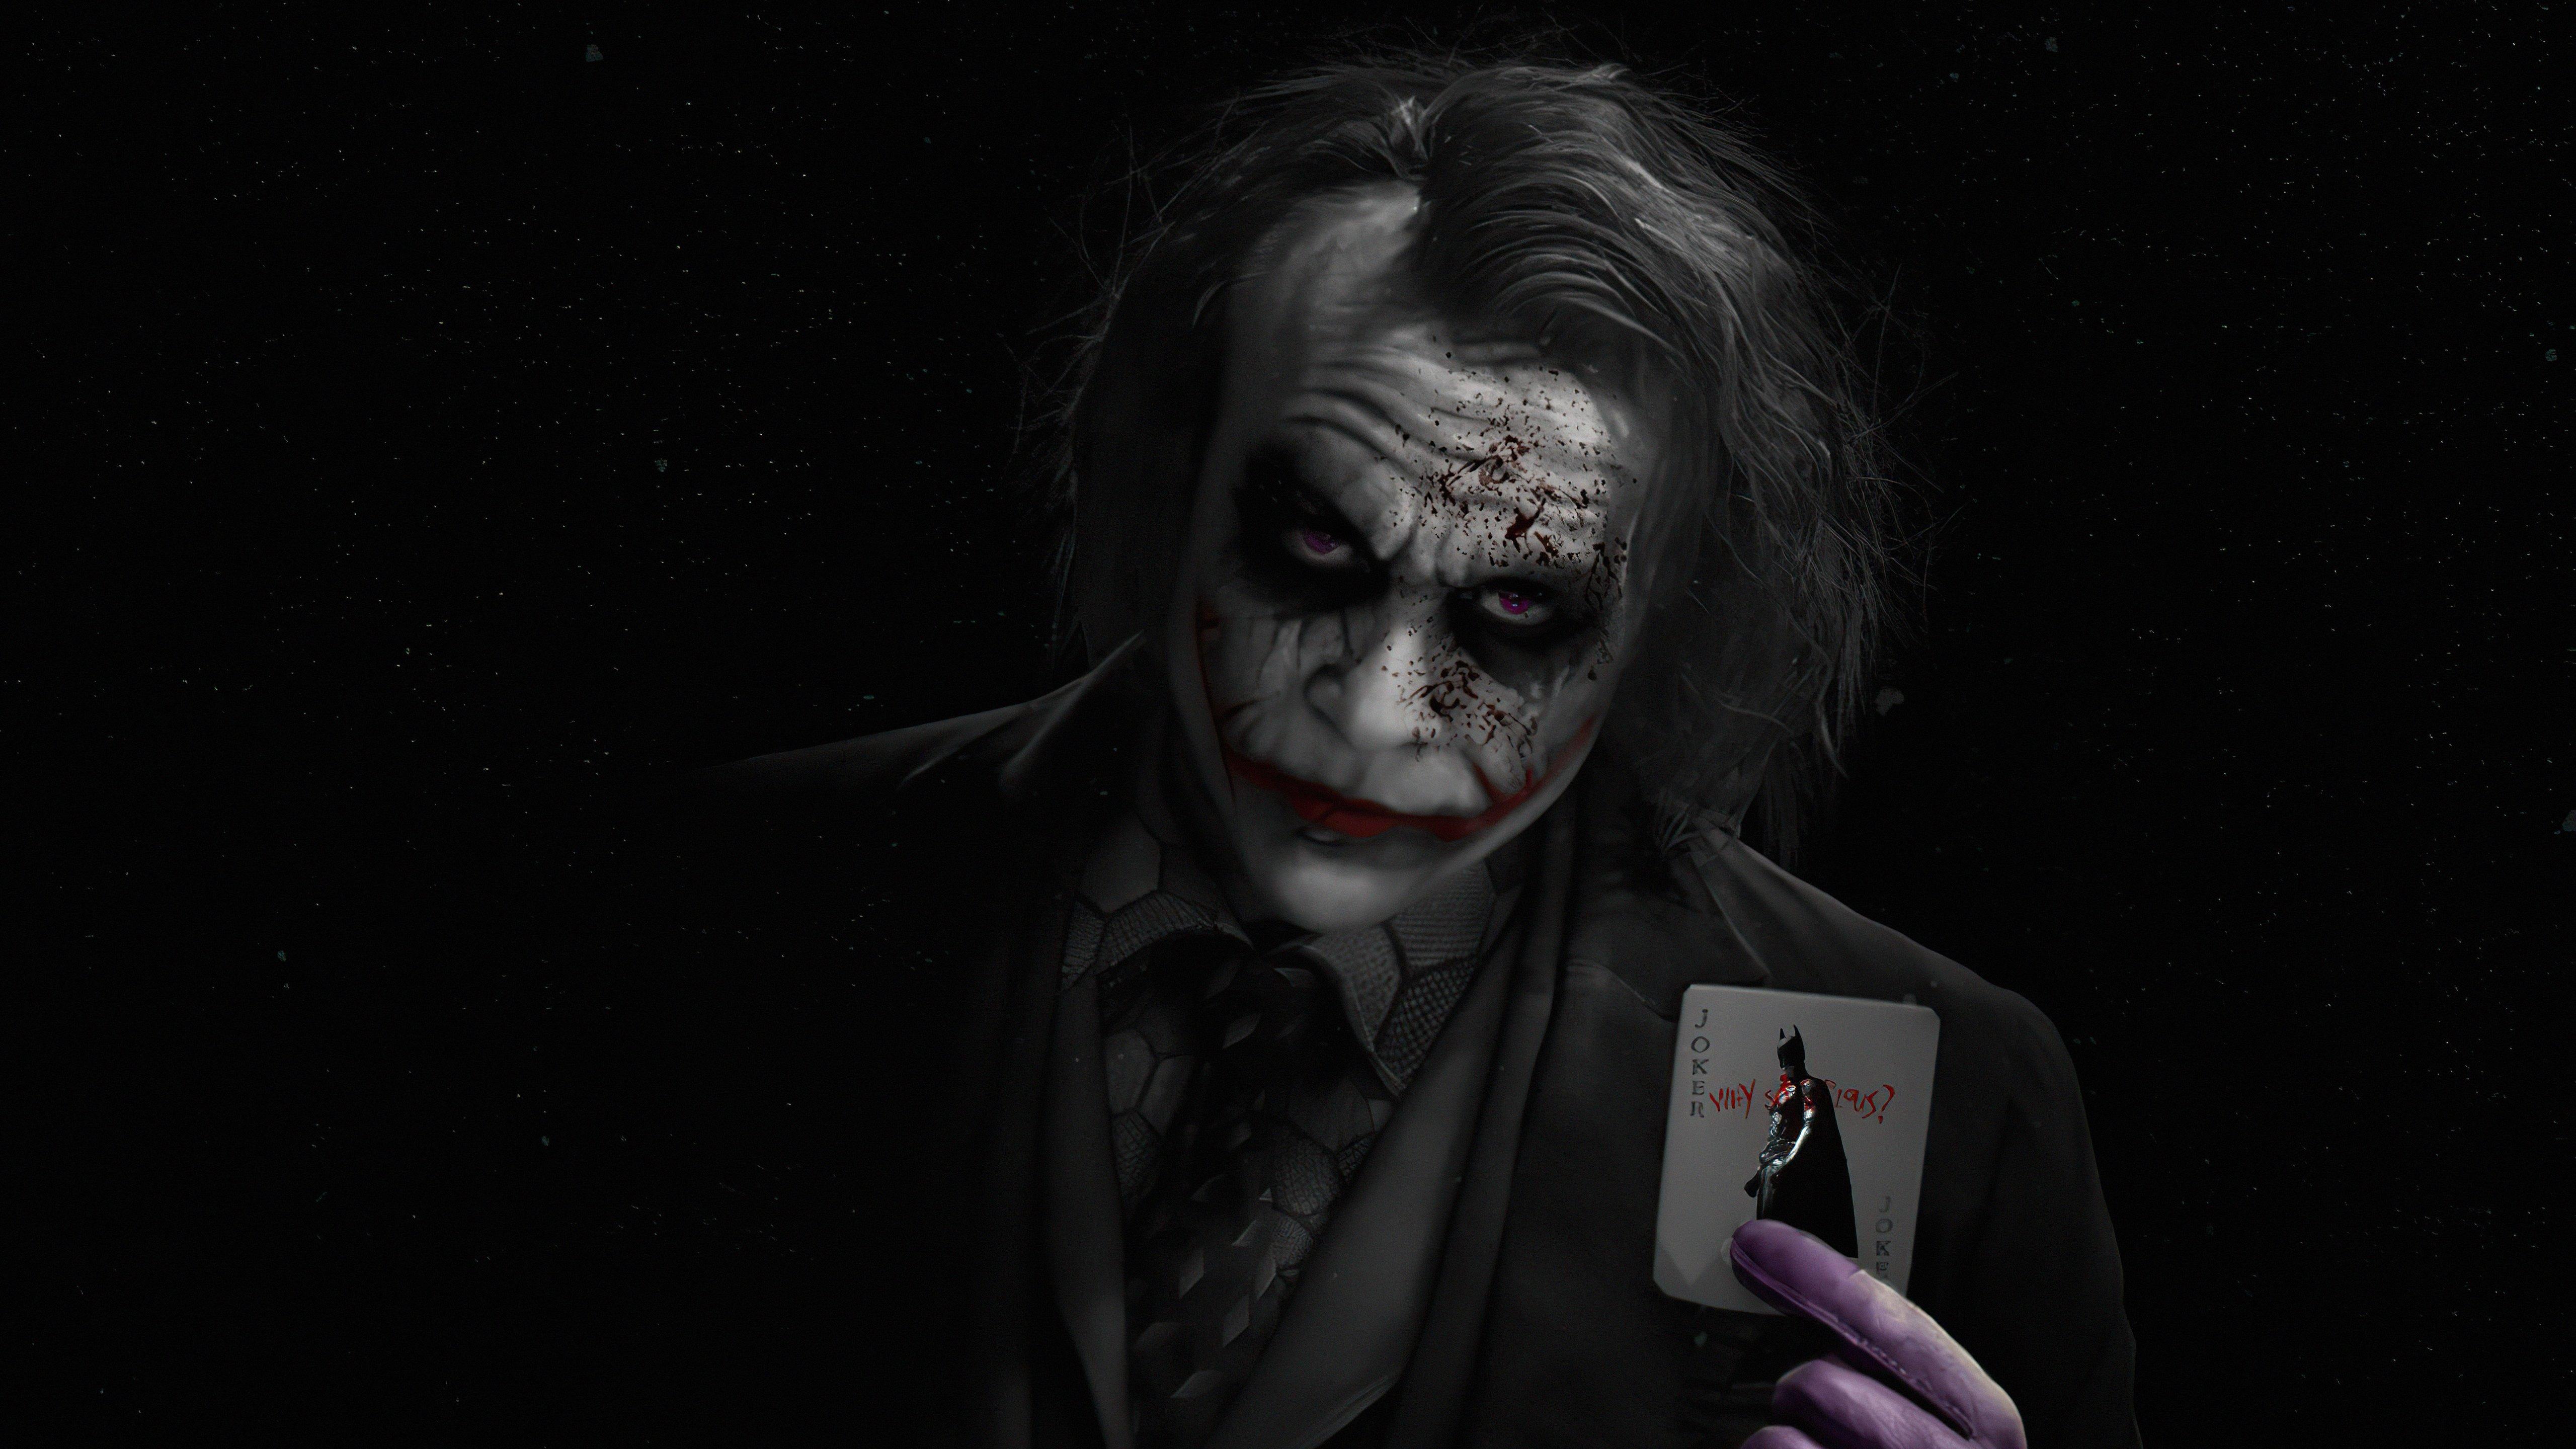 Wallpaper Heath Ledger as Joker with card